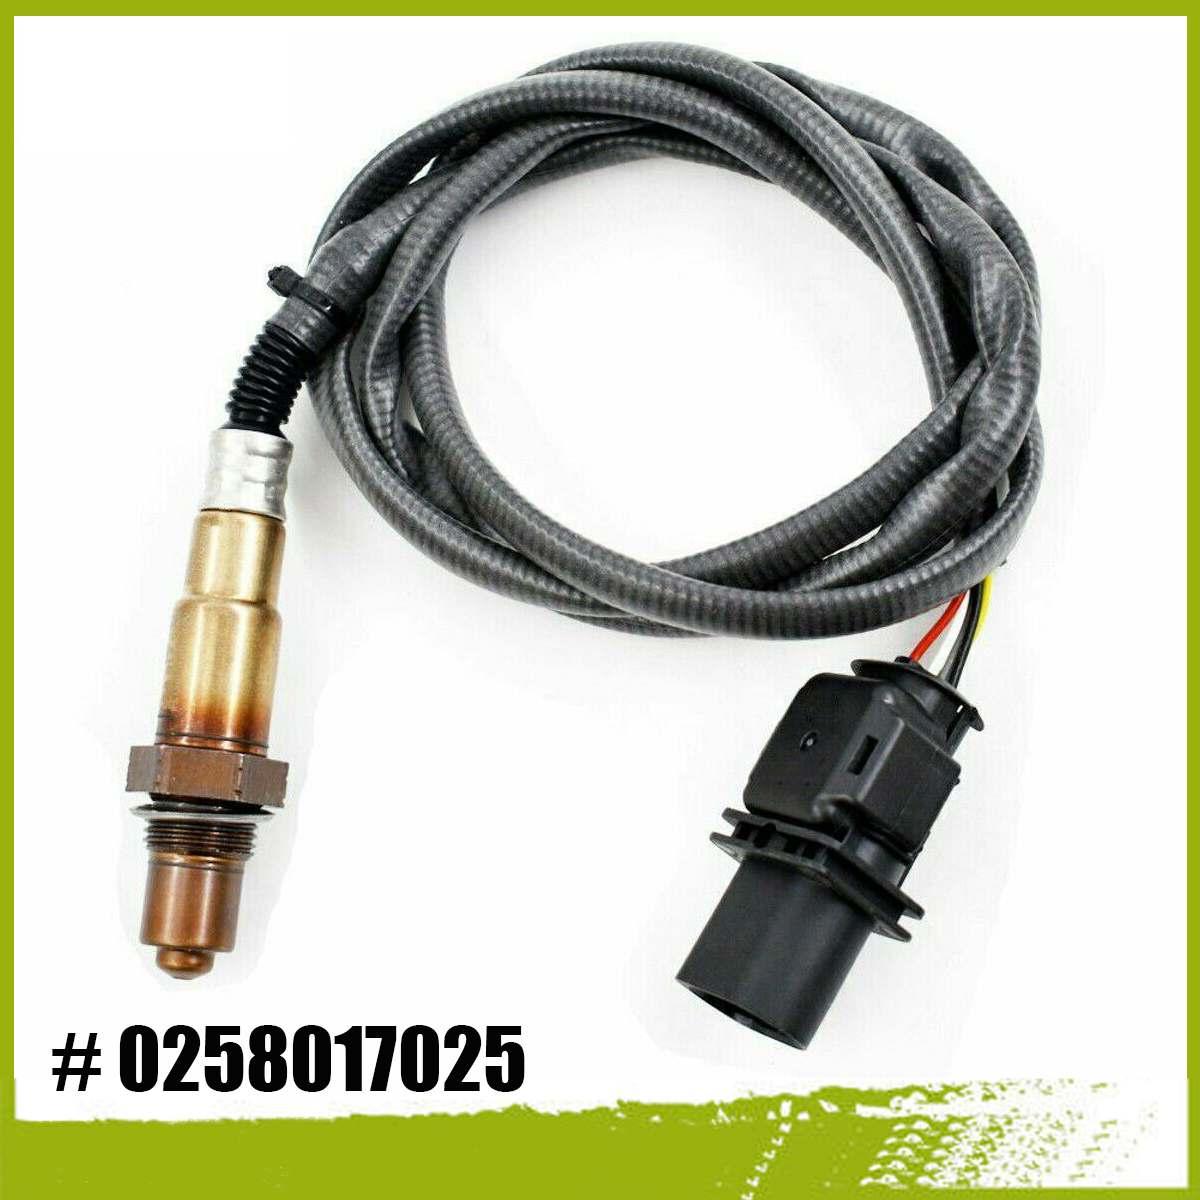 Hohe Qualität 0258017025 LSU 4,9 Luft Kraftstoff Sauerstoff Sensor Breitband O2 Abgas Sauerstoff Sensor LSU 4,9 17025 5 Draht